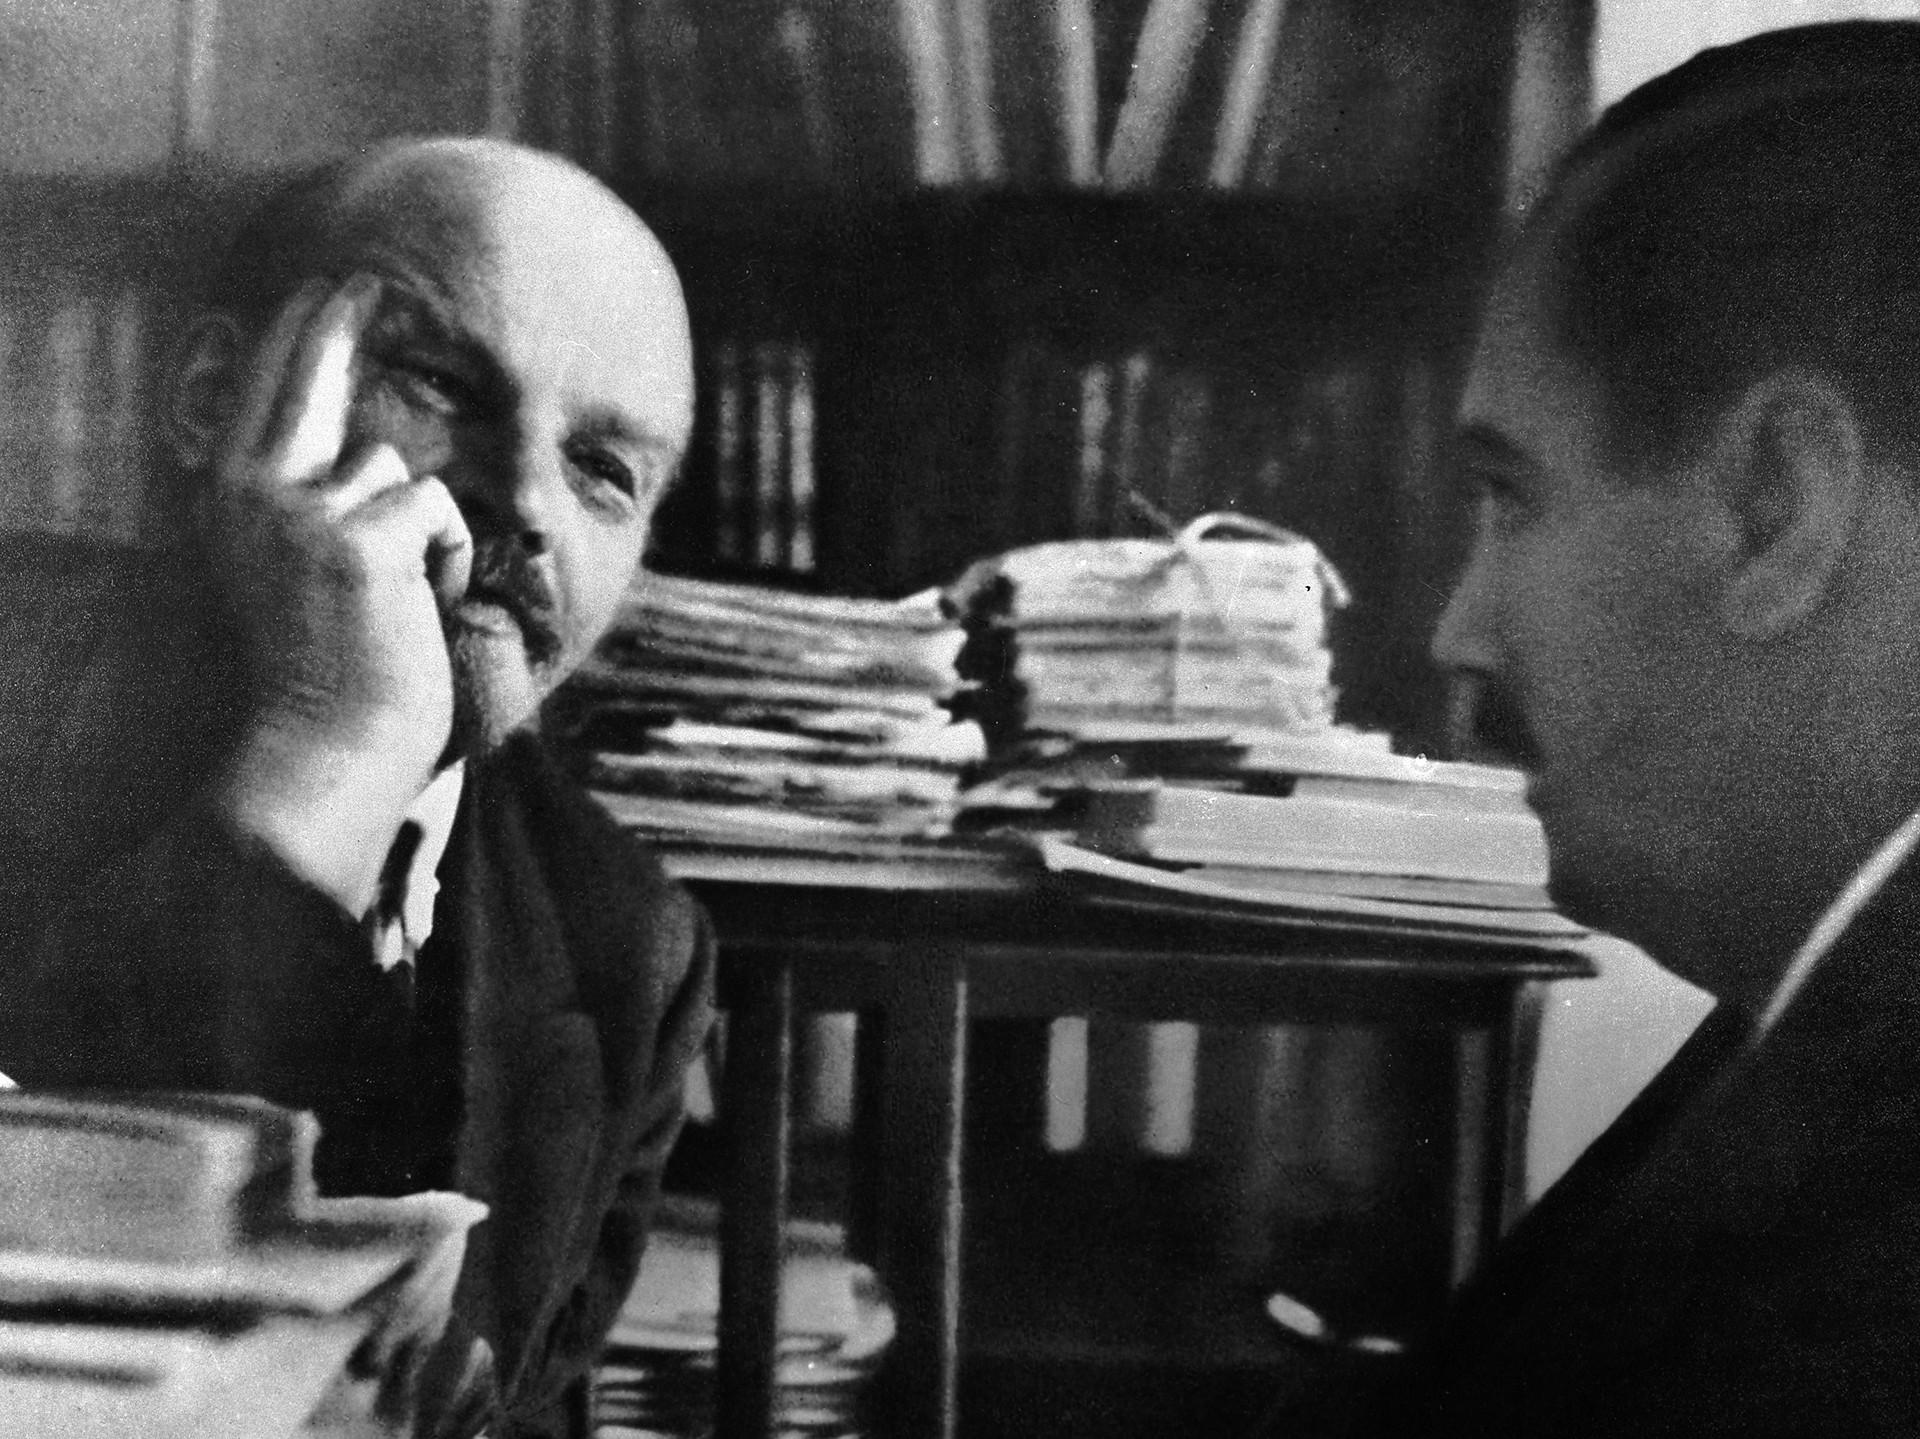 Vladímir Lenin (a la izquierda) y Herbert Wells en el Kremlin.